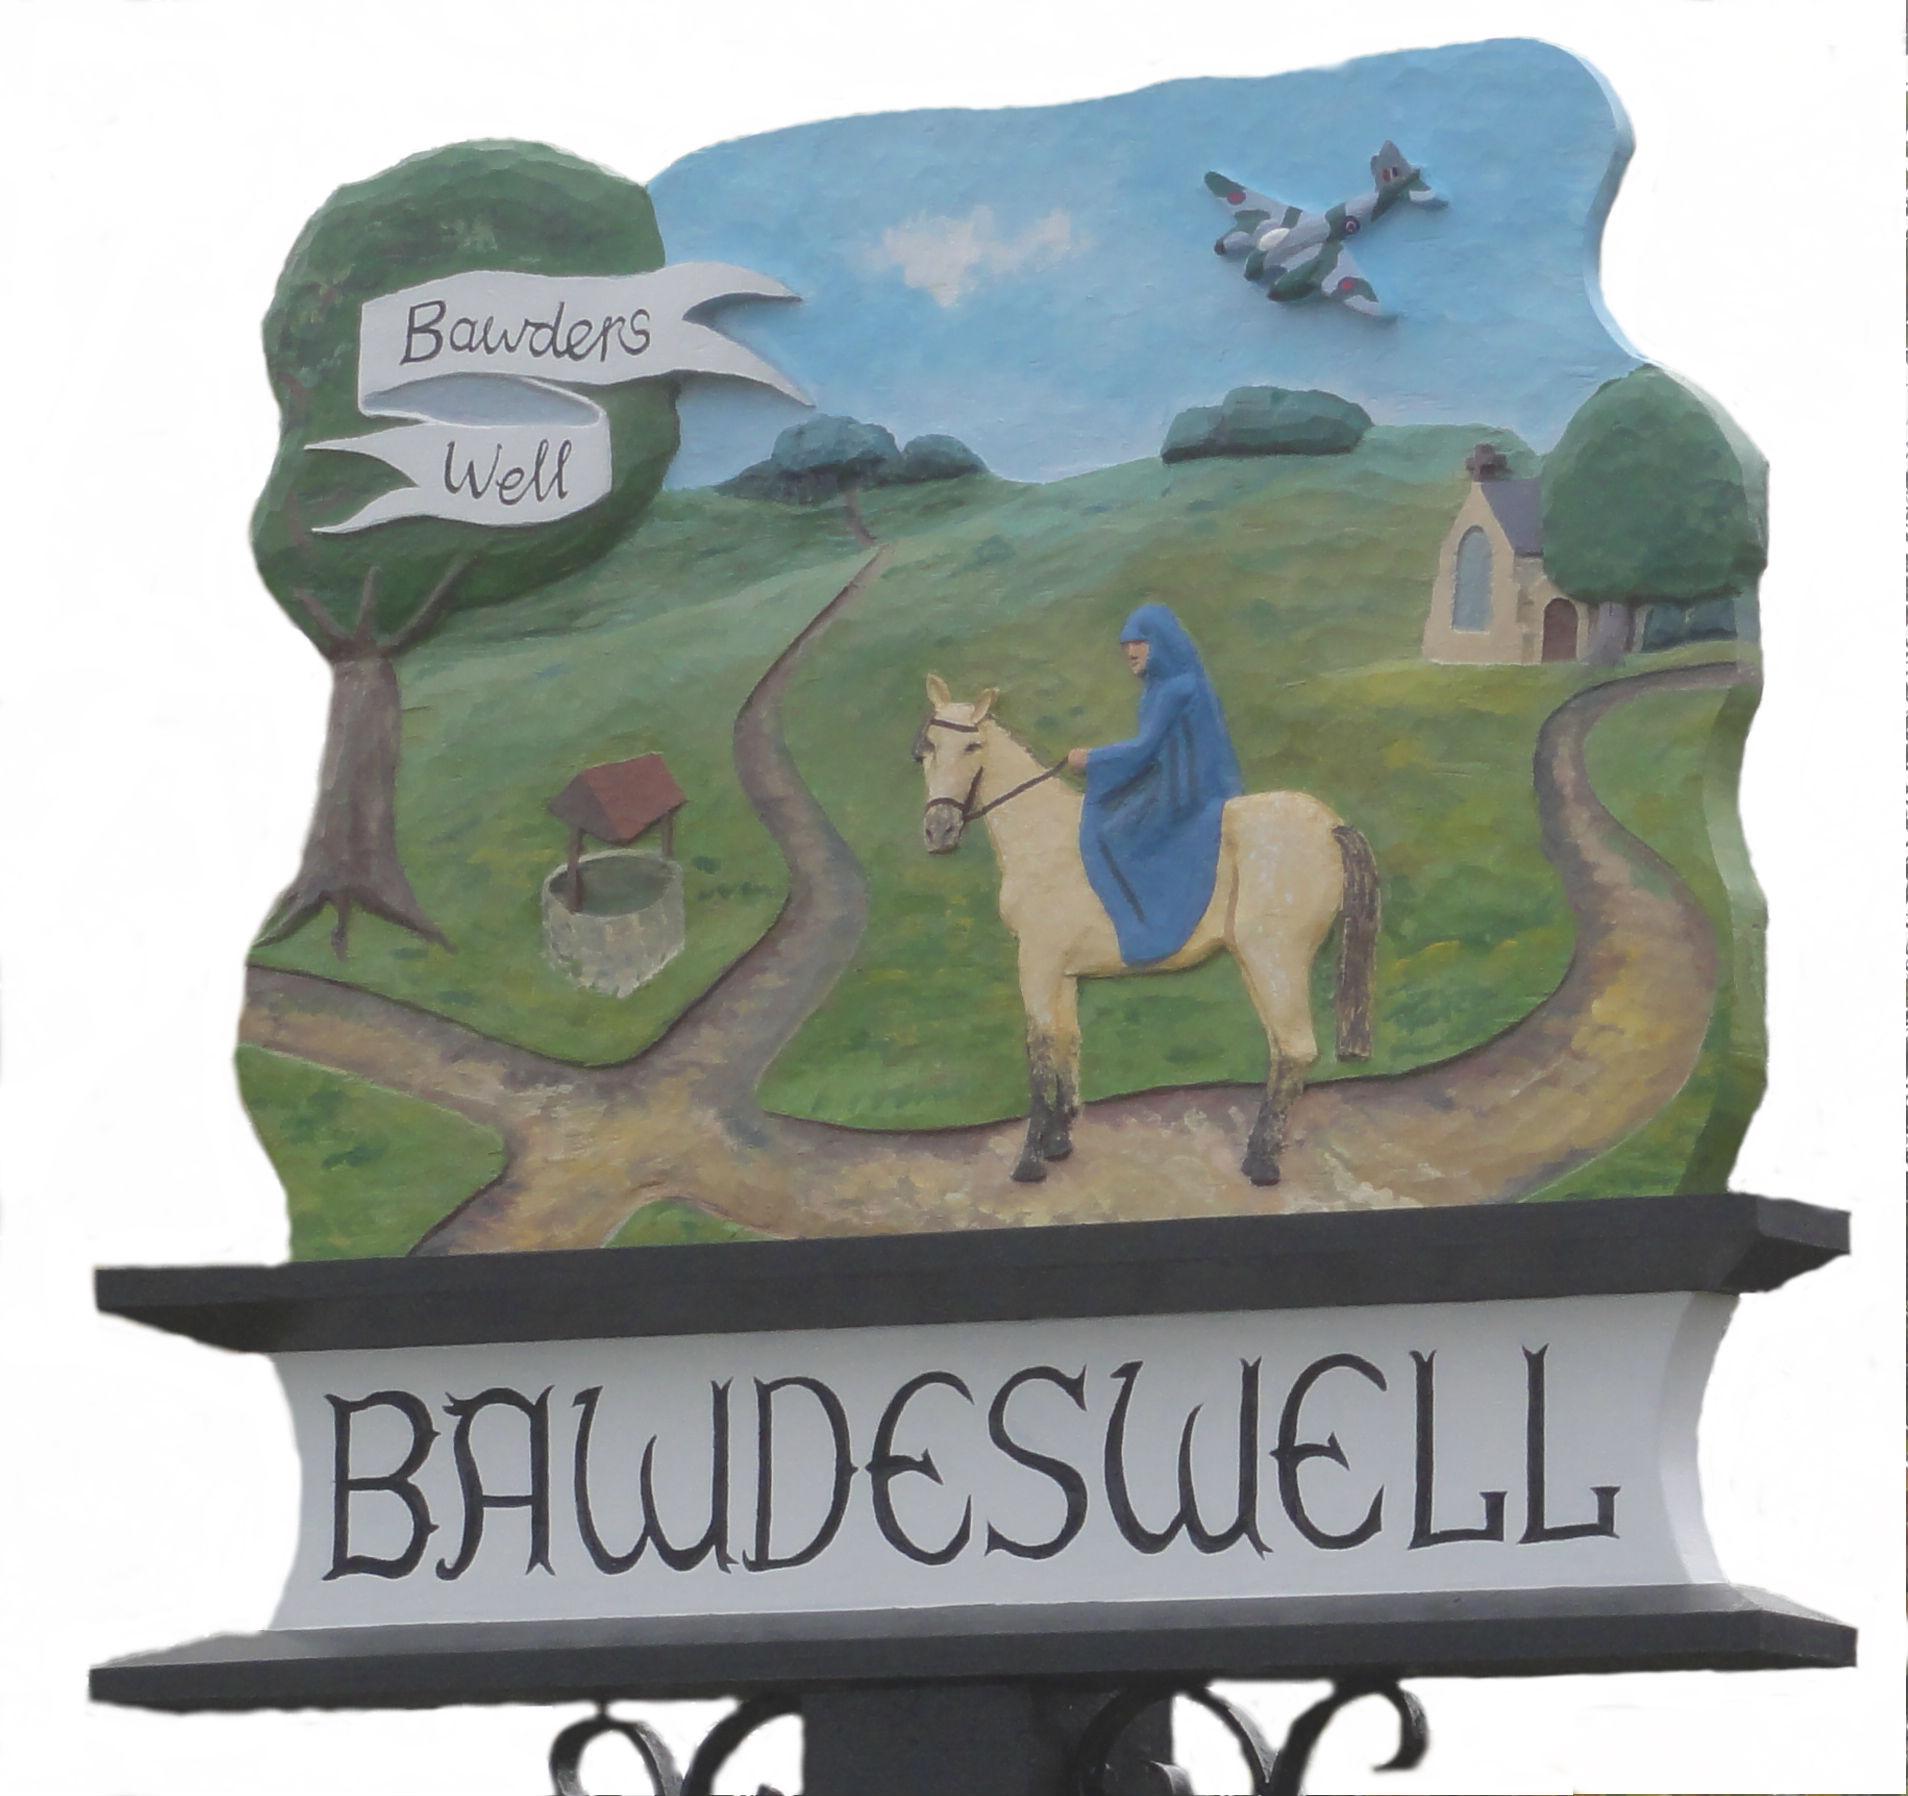 Bawdeswell village sign